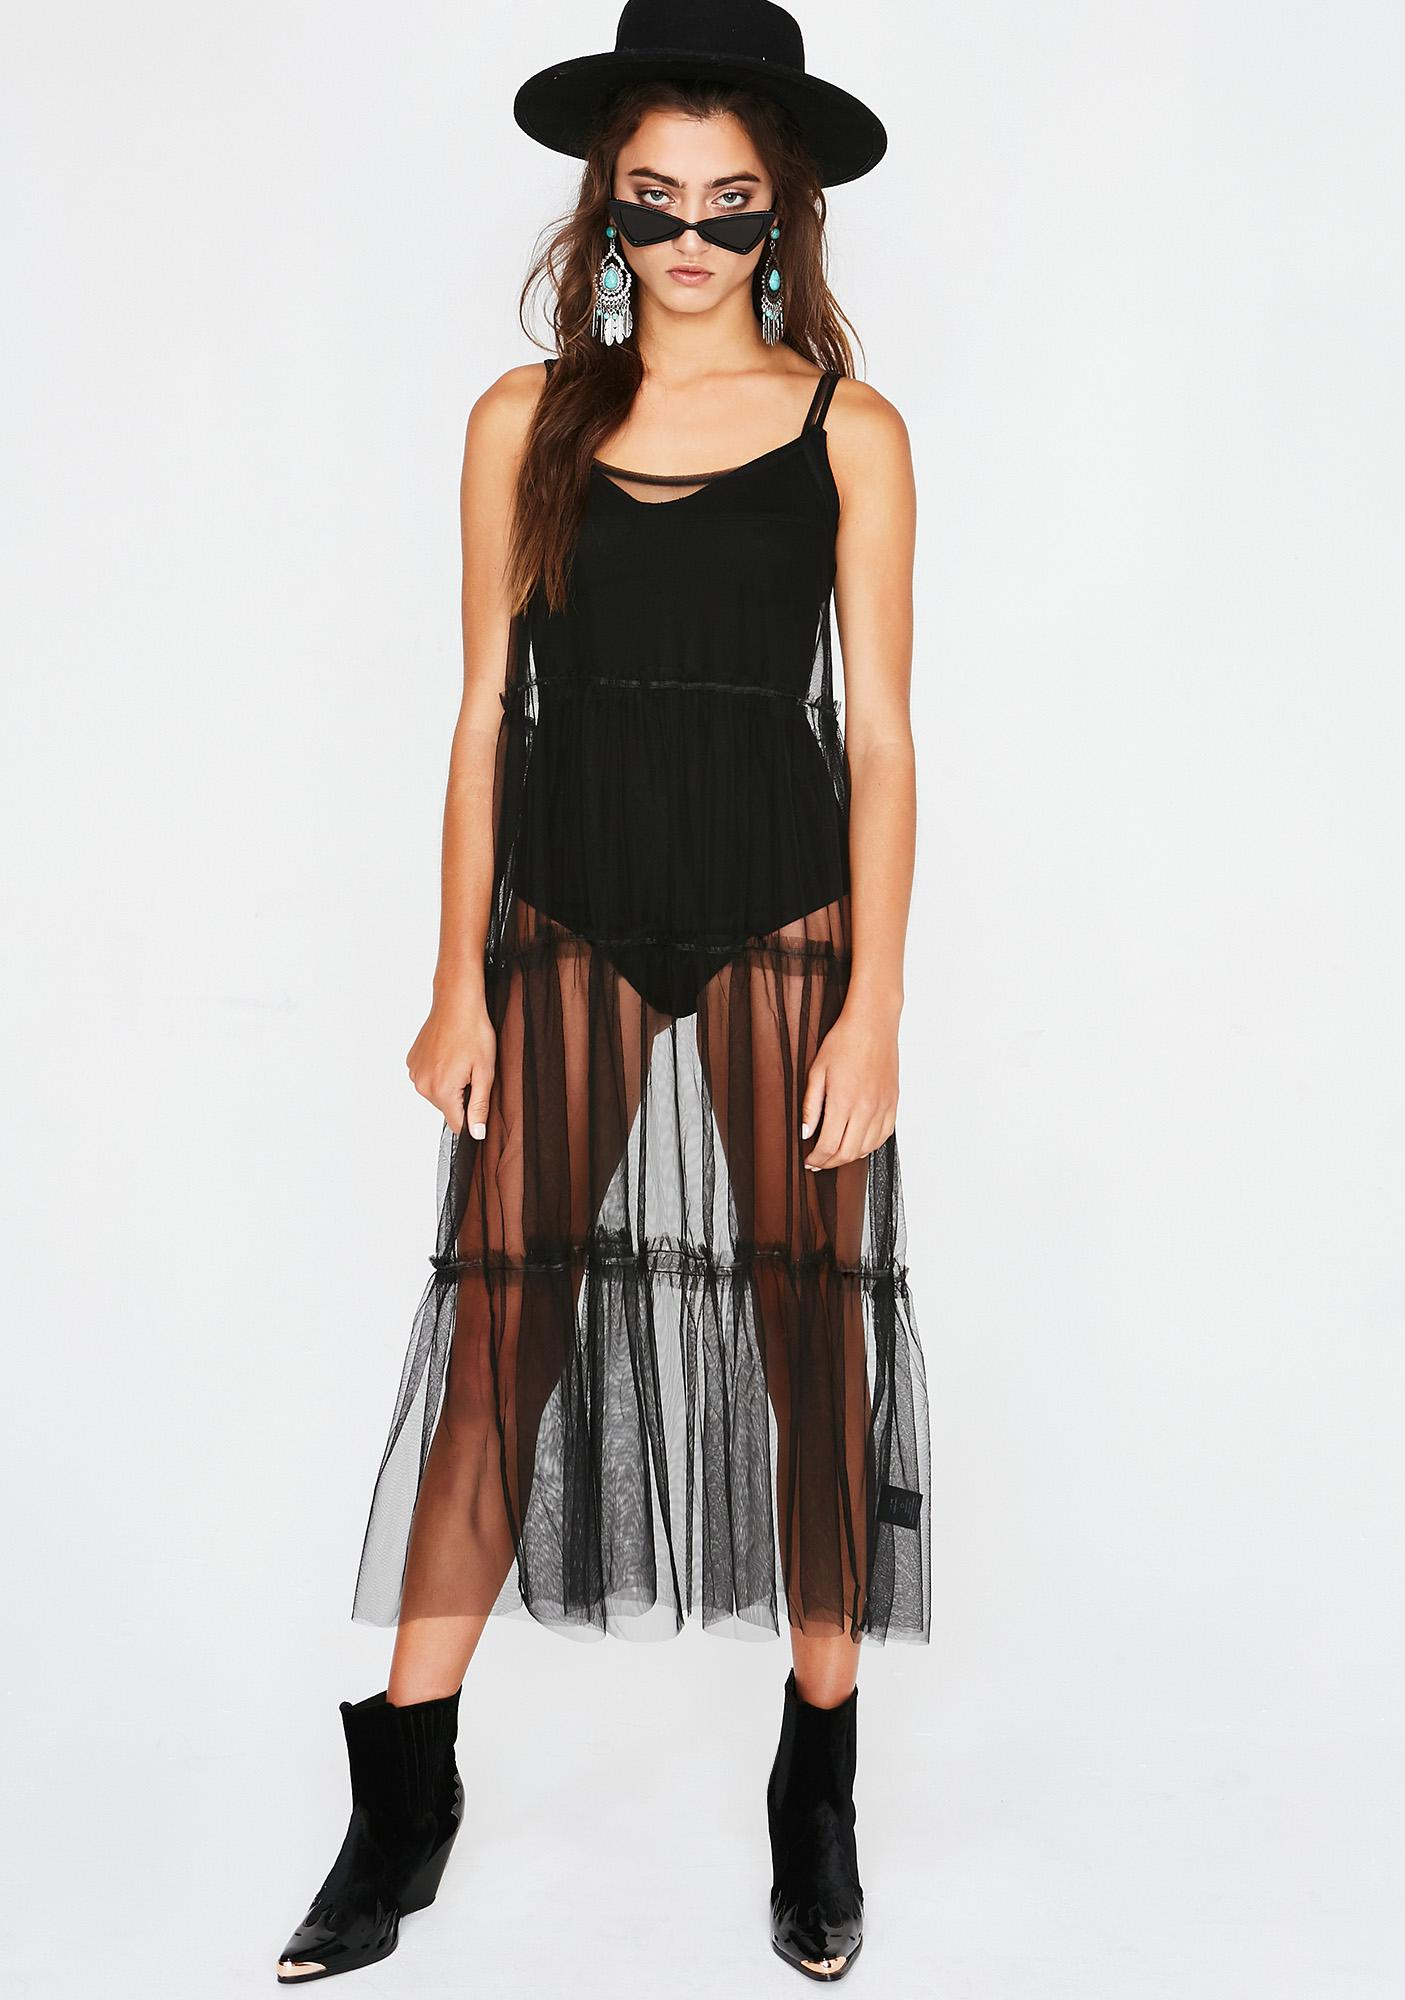 Midnight Ballerina Baddie Sheer Dress